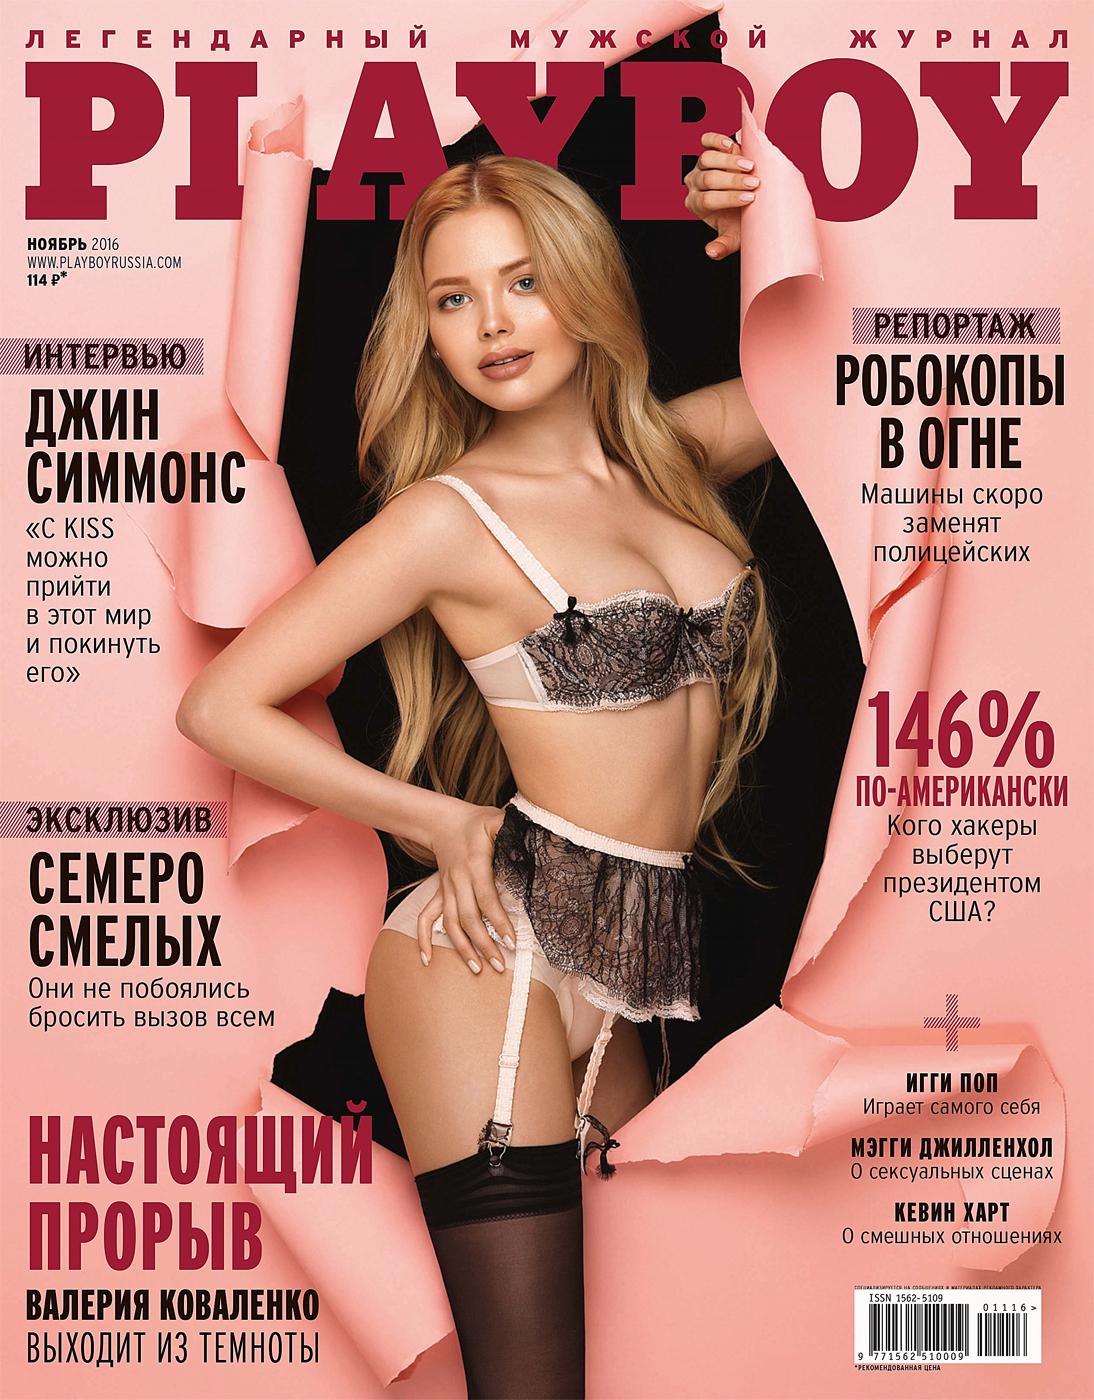 Russia playboy Playboy TV